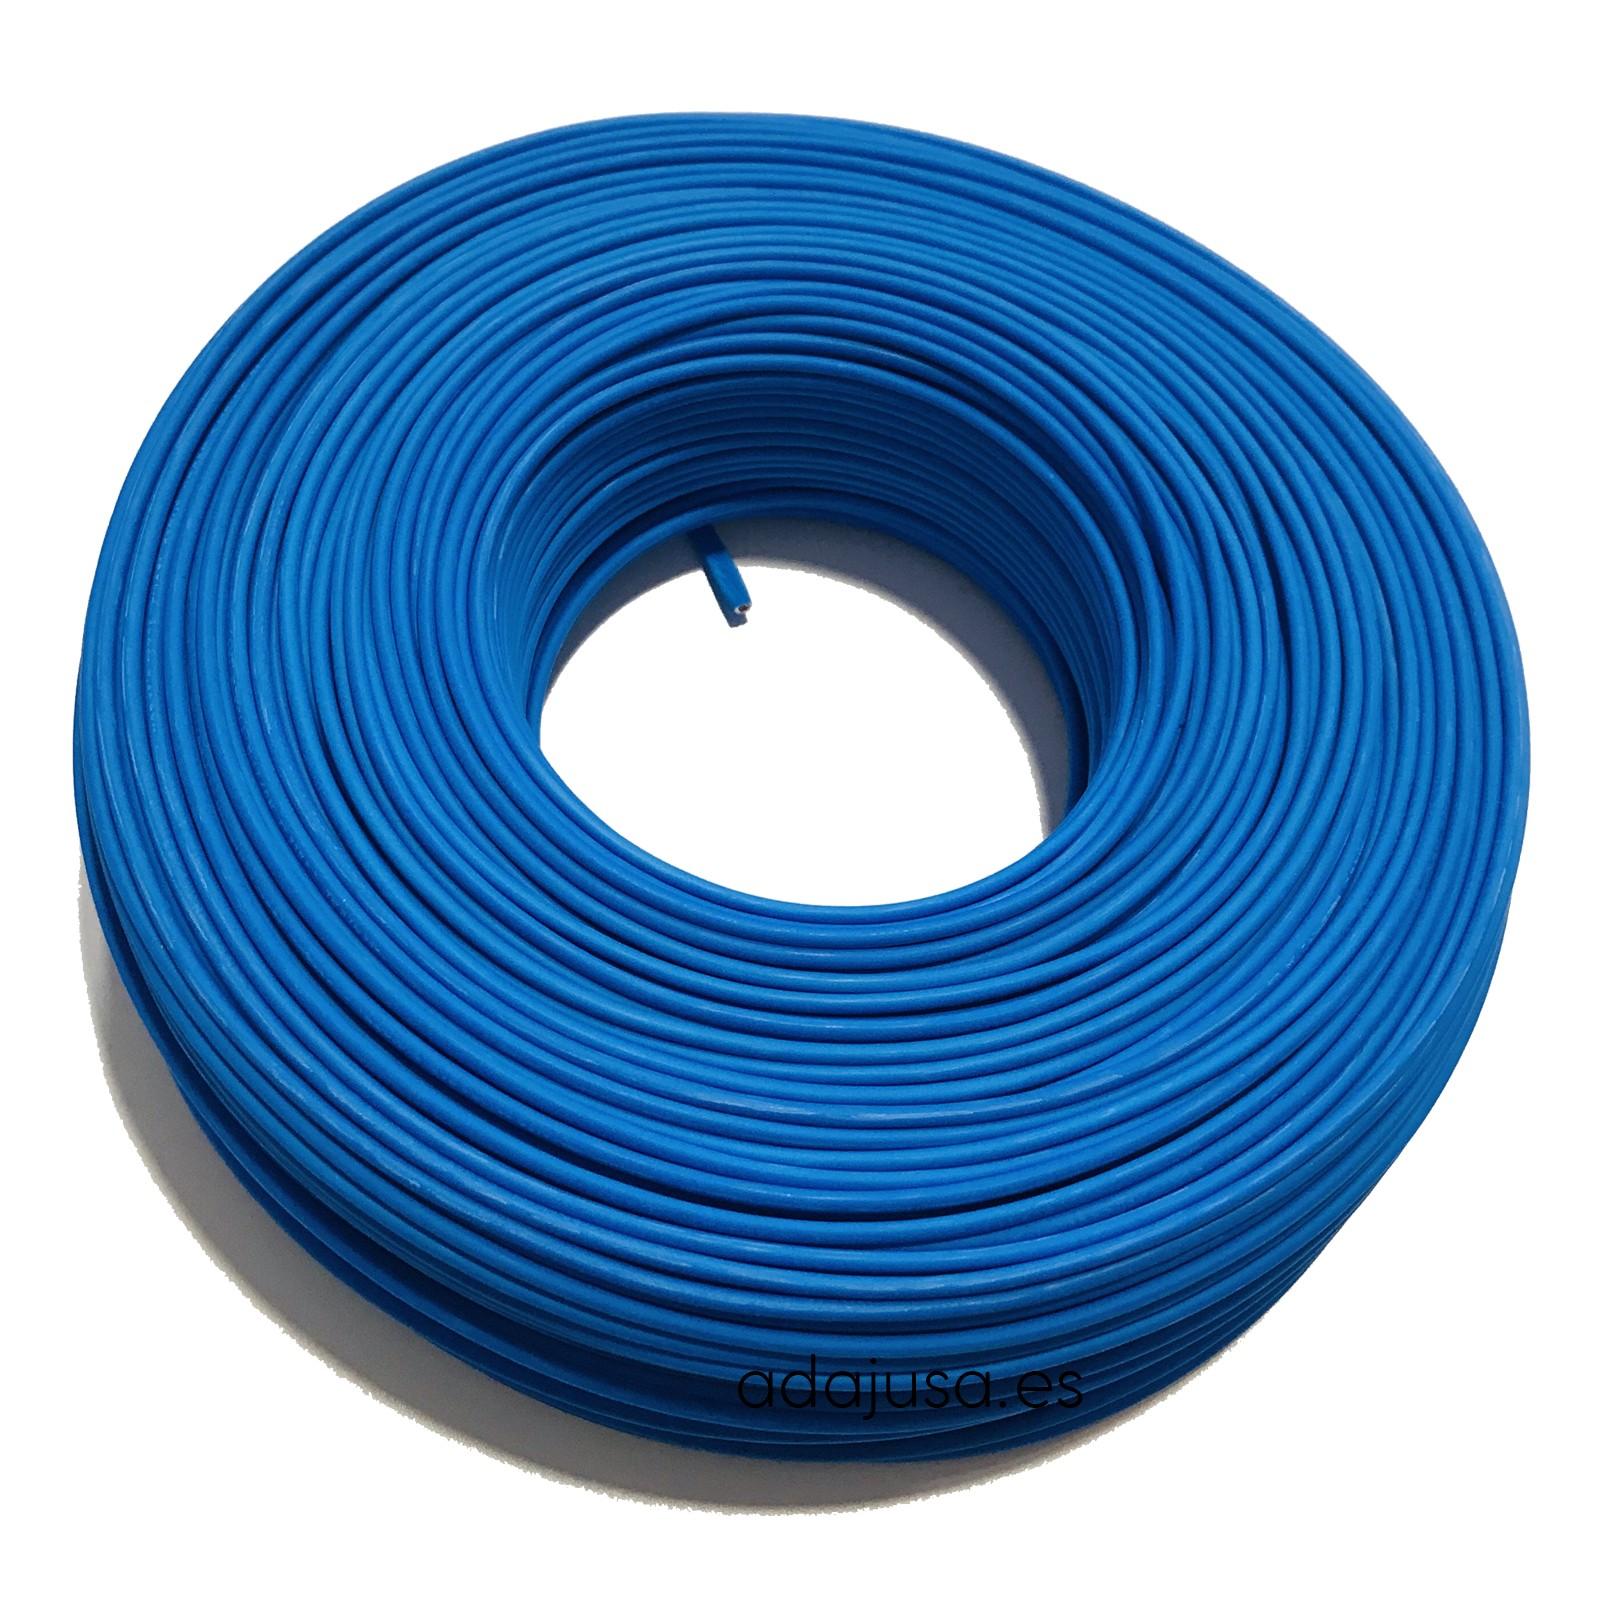 Cable flexible unipolar 4 mm color azul